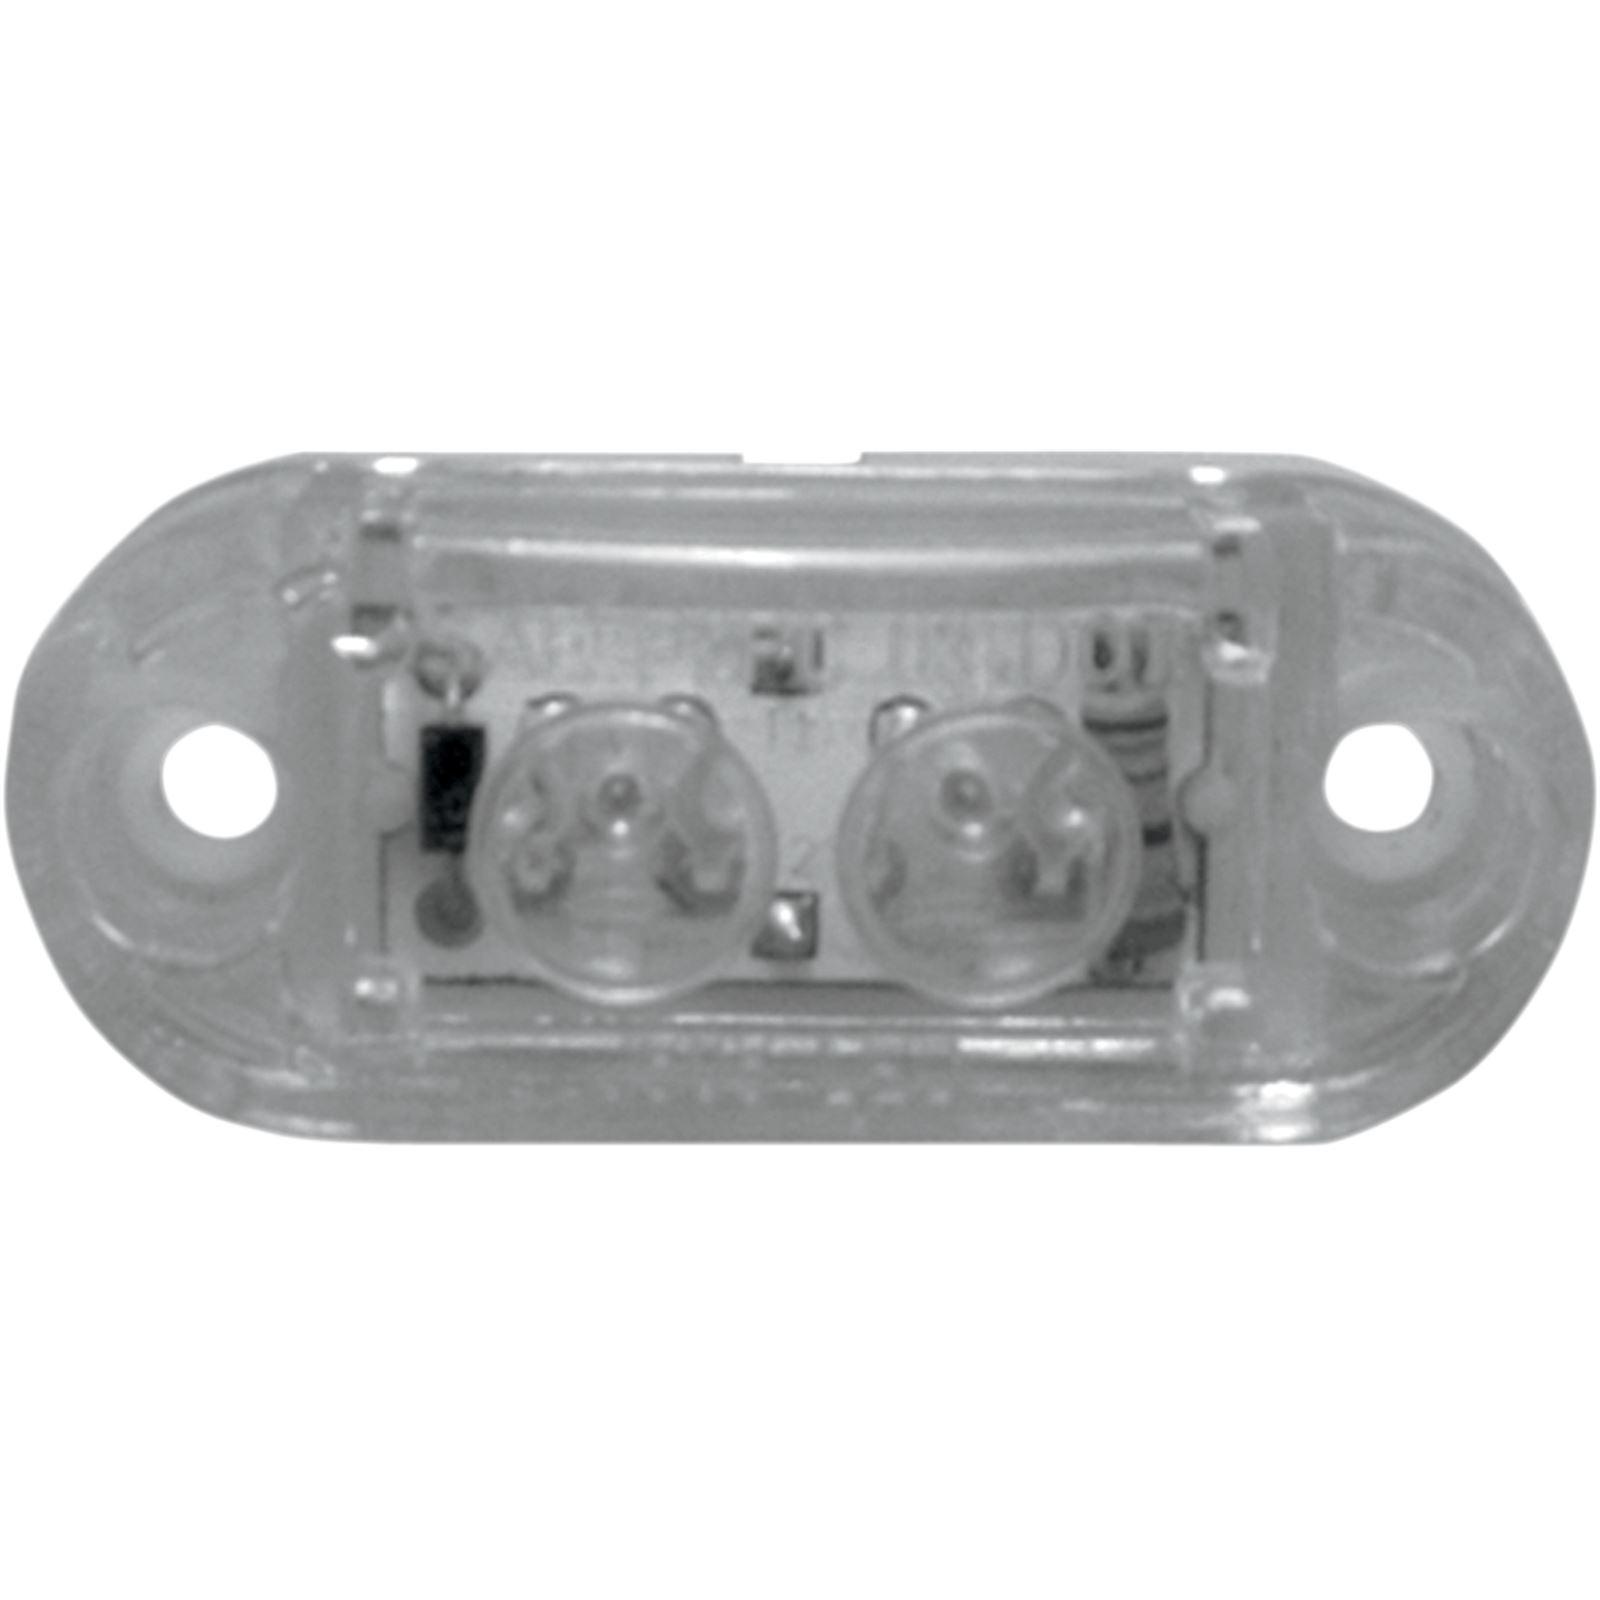 "Brite-Lites 2.5"" Oval LED Light - Amber"